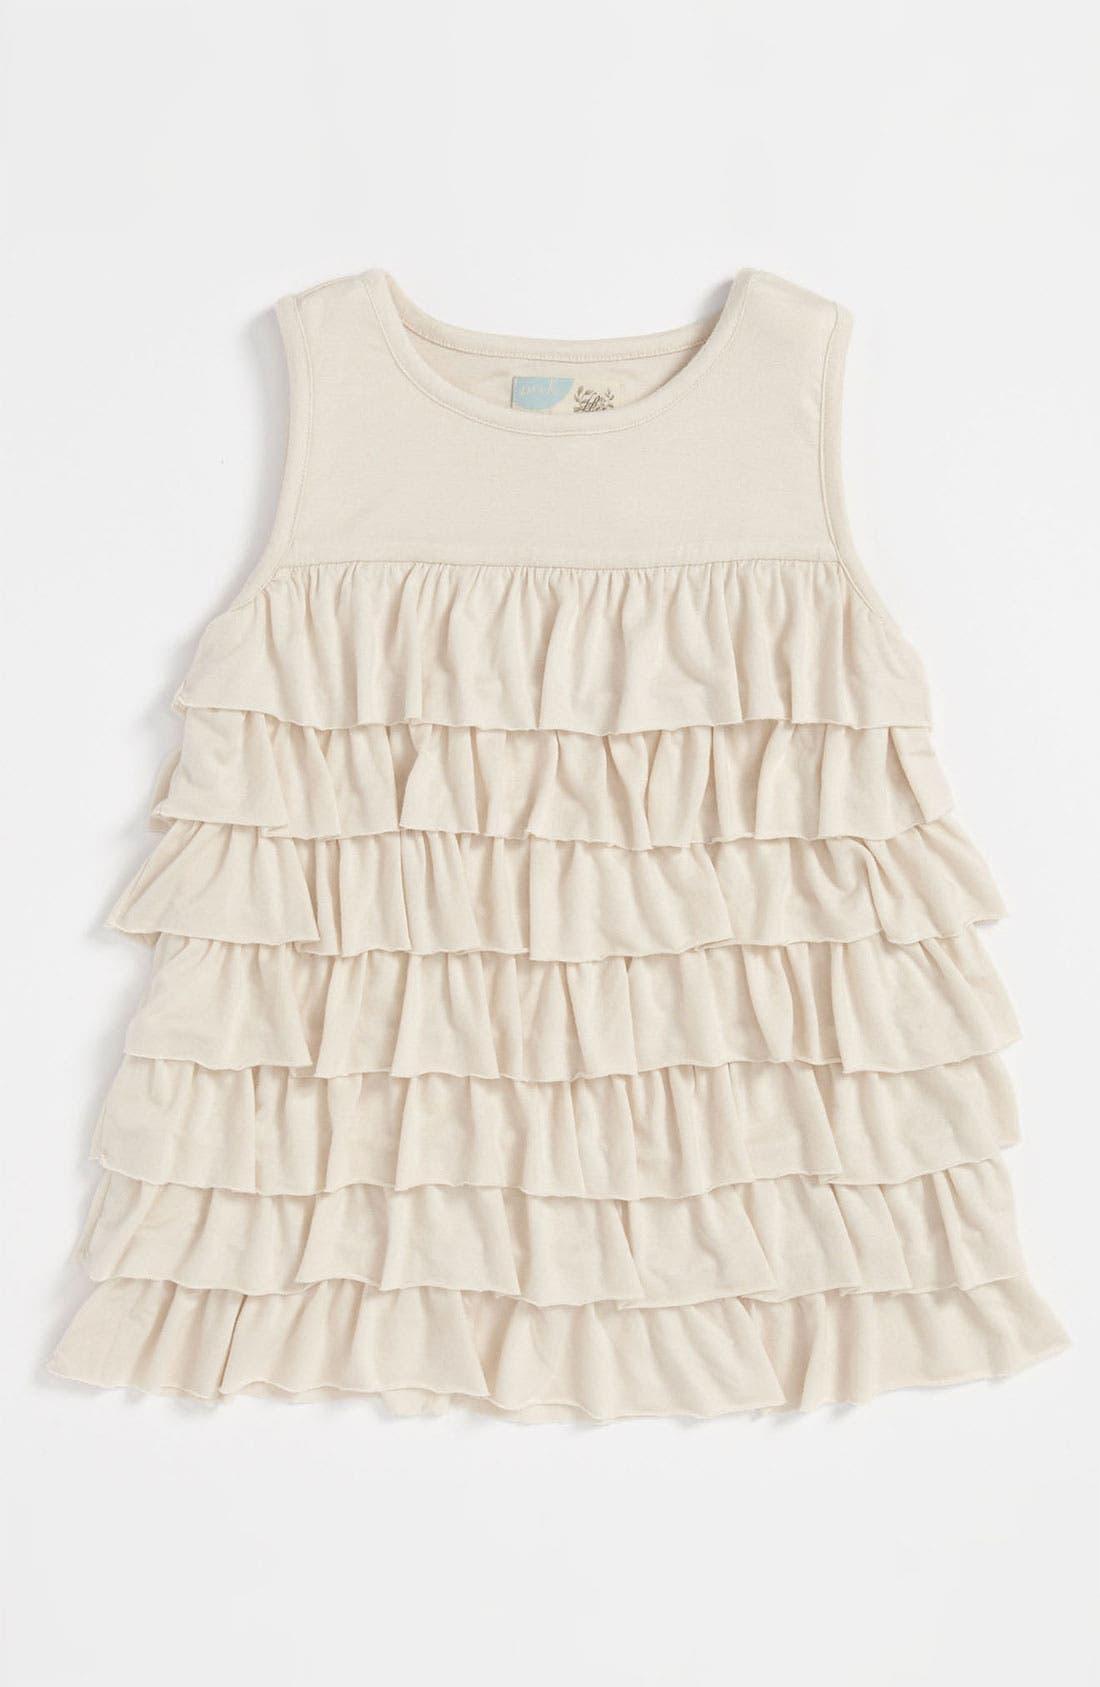 Alternate Image 1 Selected - Peek 'Myrna' Top (Toddler, Little Girls & Big Girls)